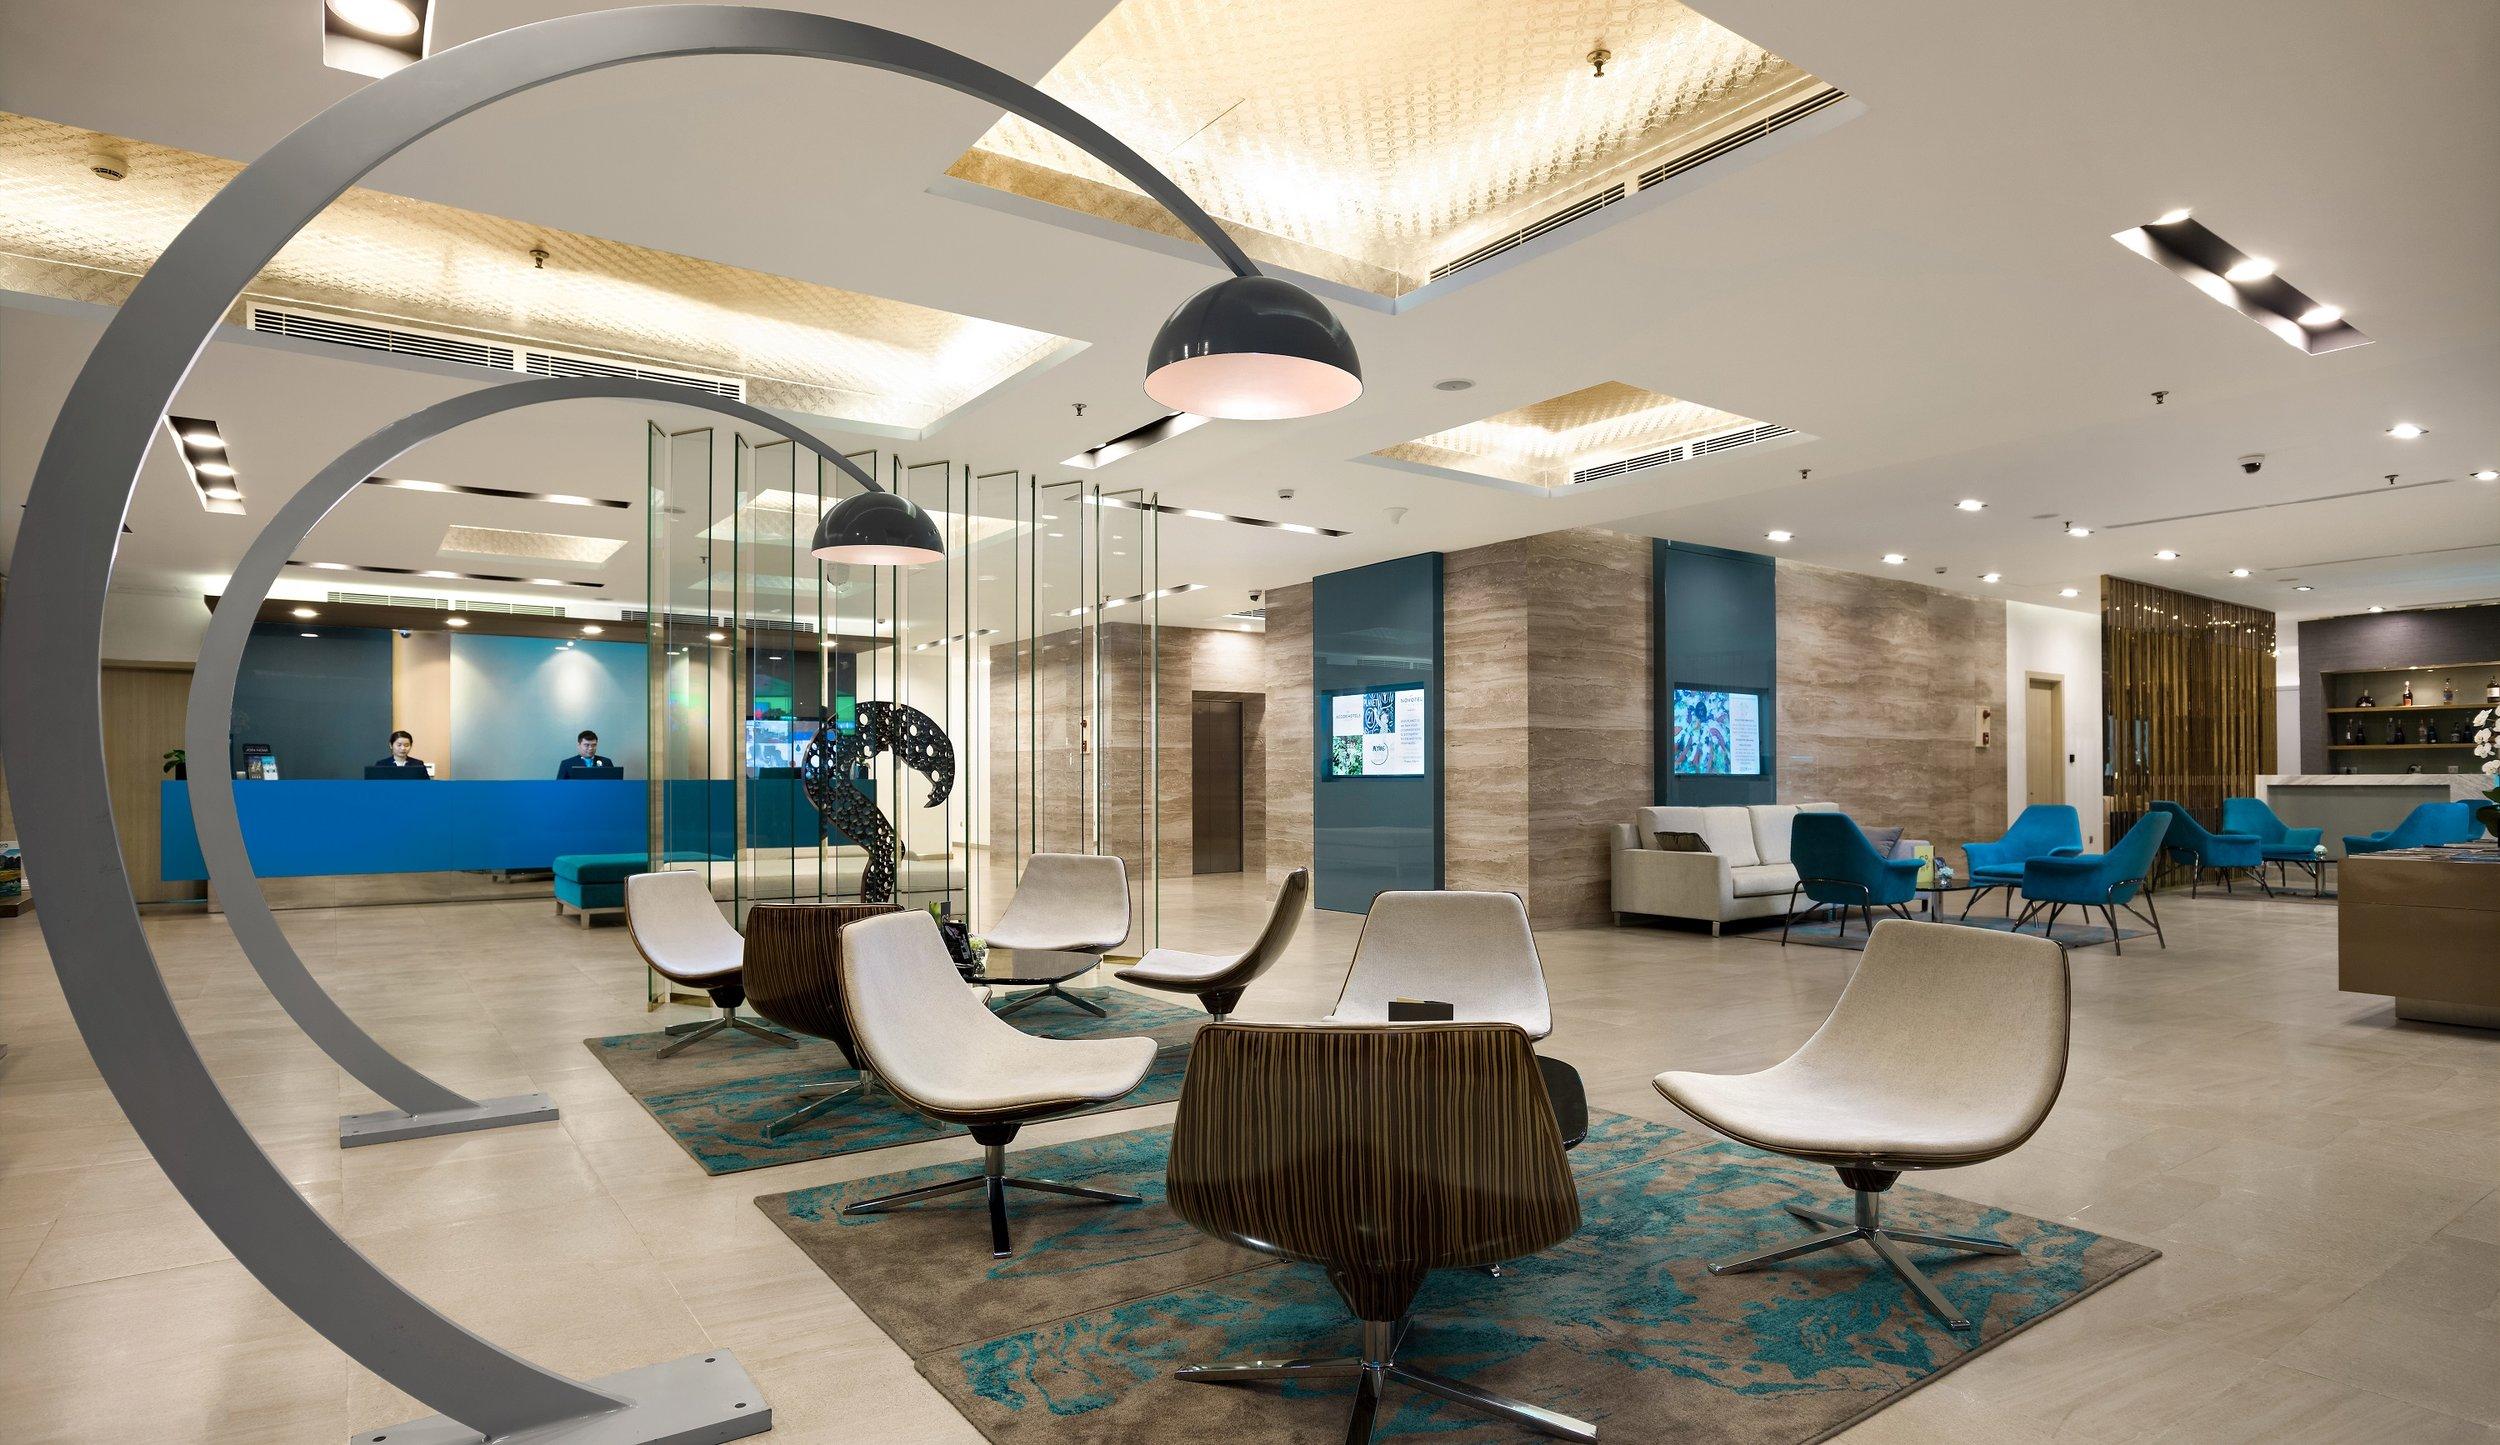 Reception | Photo Credit: Novotel Suites Hanoi